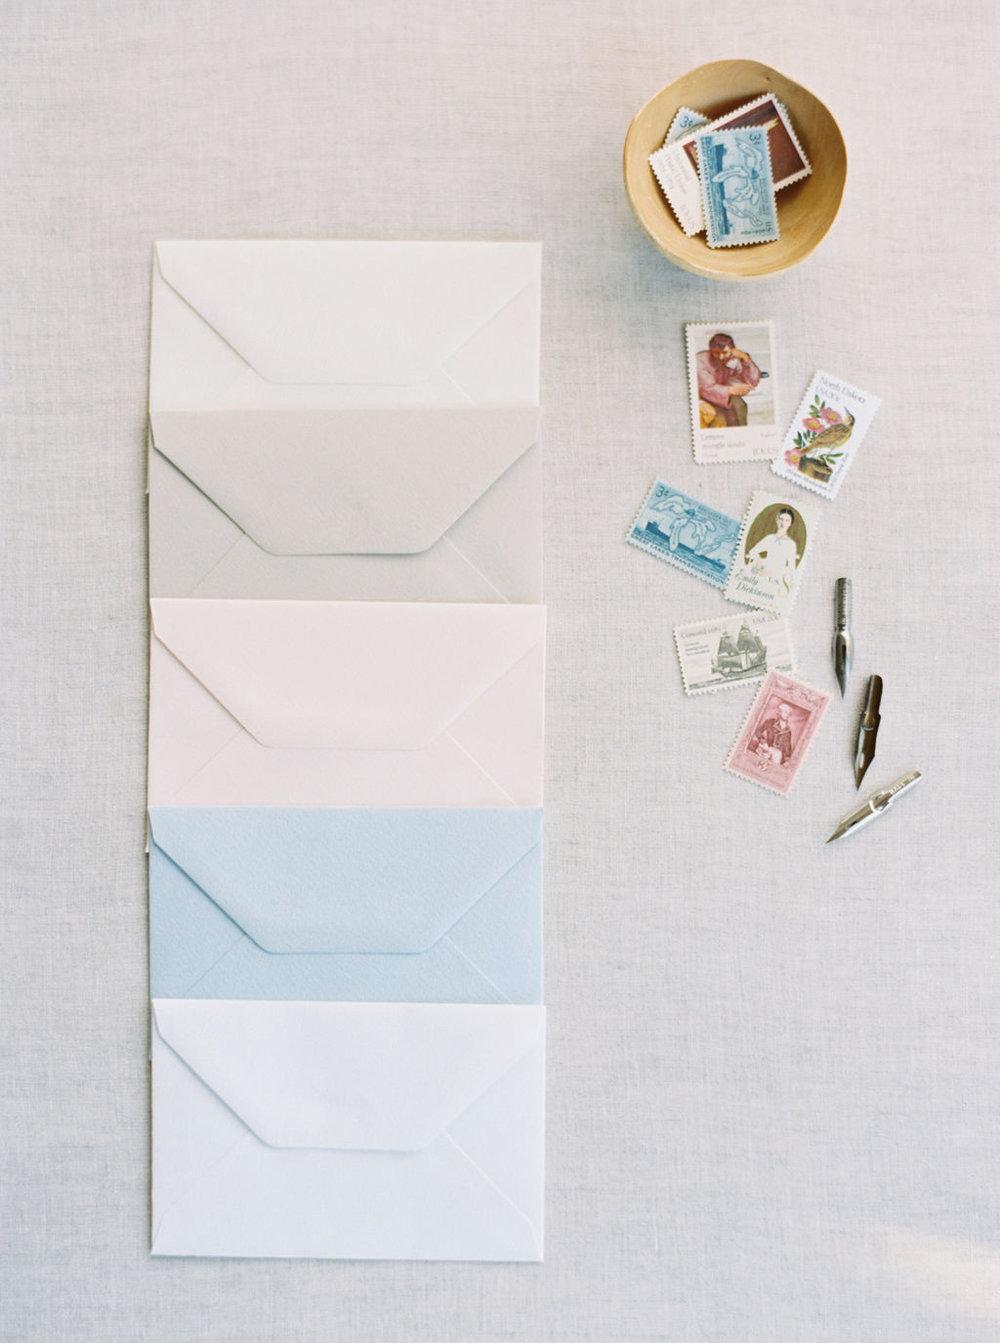 Ciarra Claire envelope color options. Natural white, warm grey, blush, pale blue, bright white.